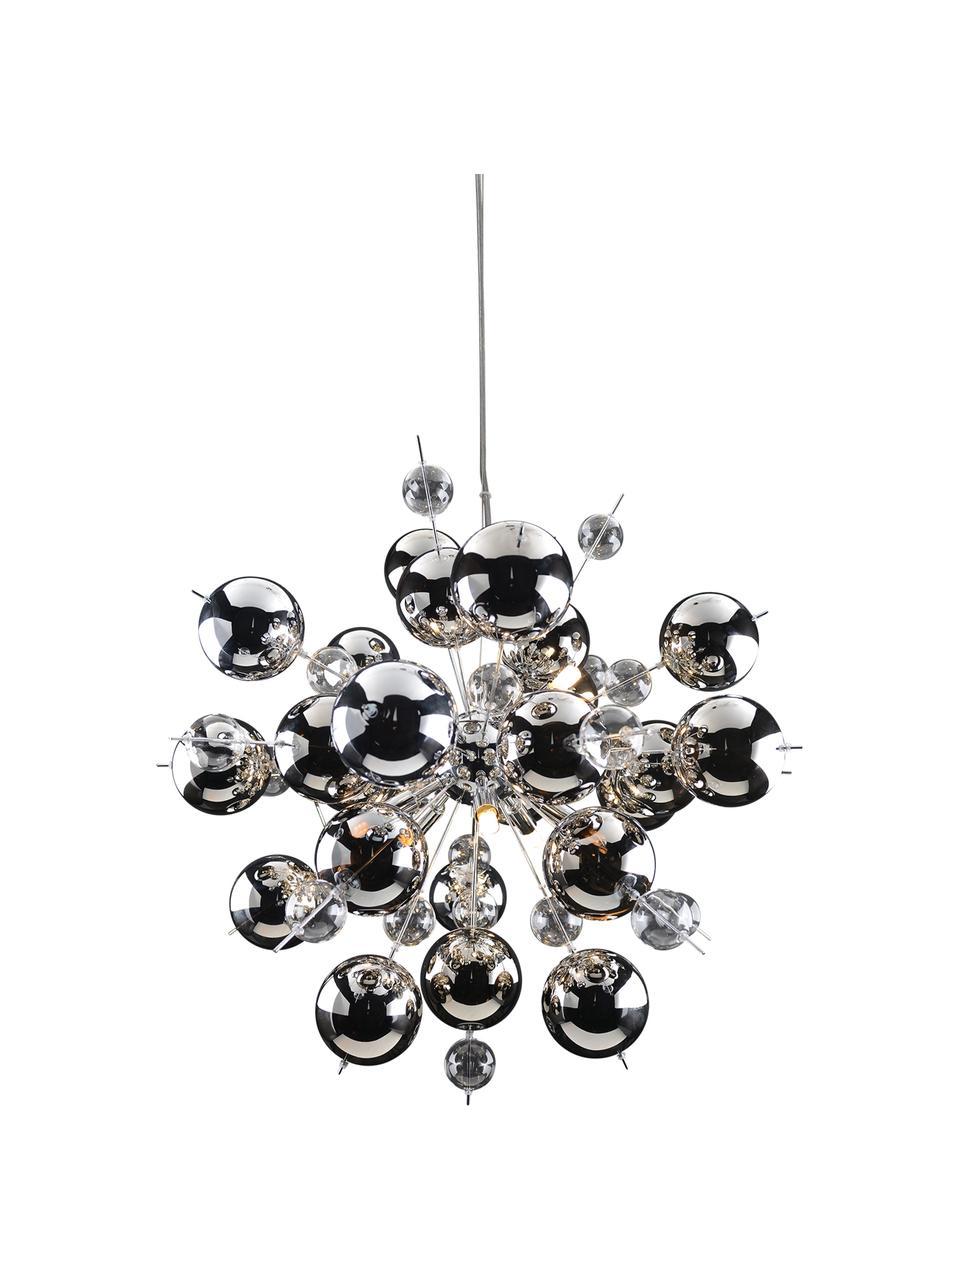 Große Pendelleuchte Explosion aus Glaskugeln, Baldachin: Metall, verchromt, Chrom, Ø 65 cm